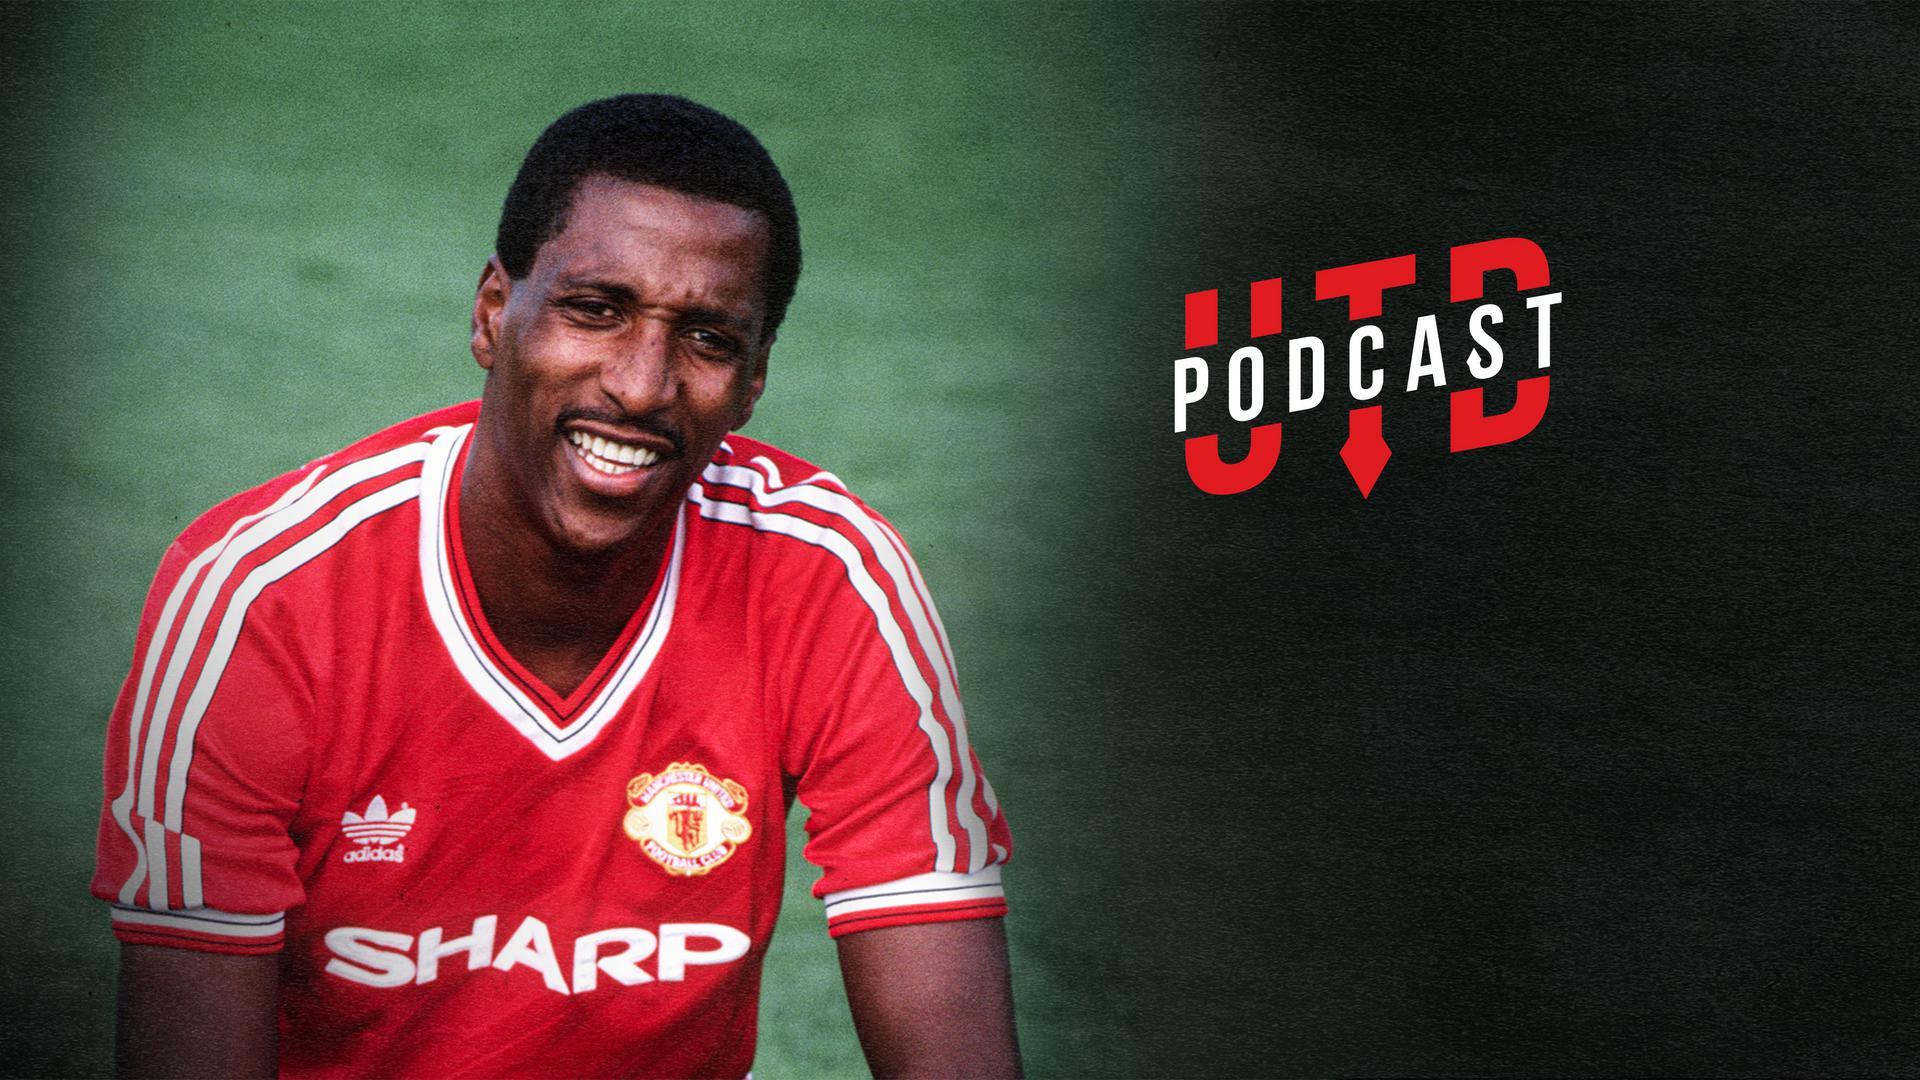 Viv's UTD Podcast is vital this Black History Month